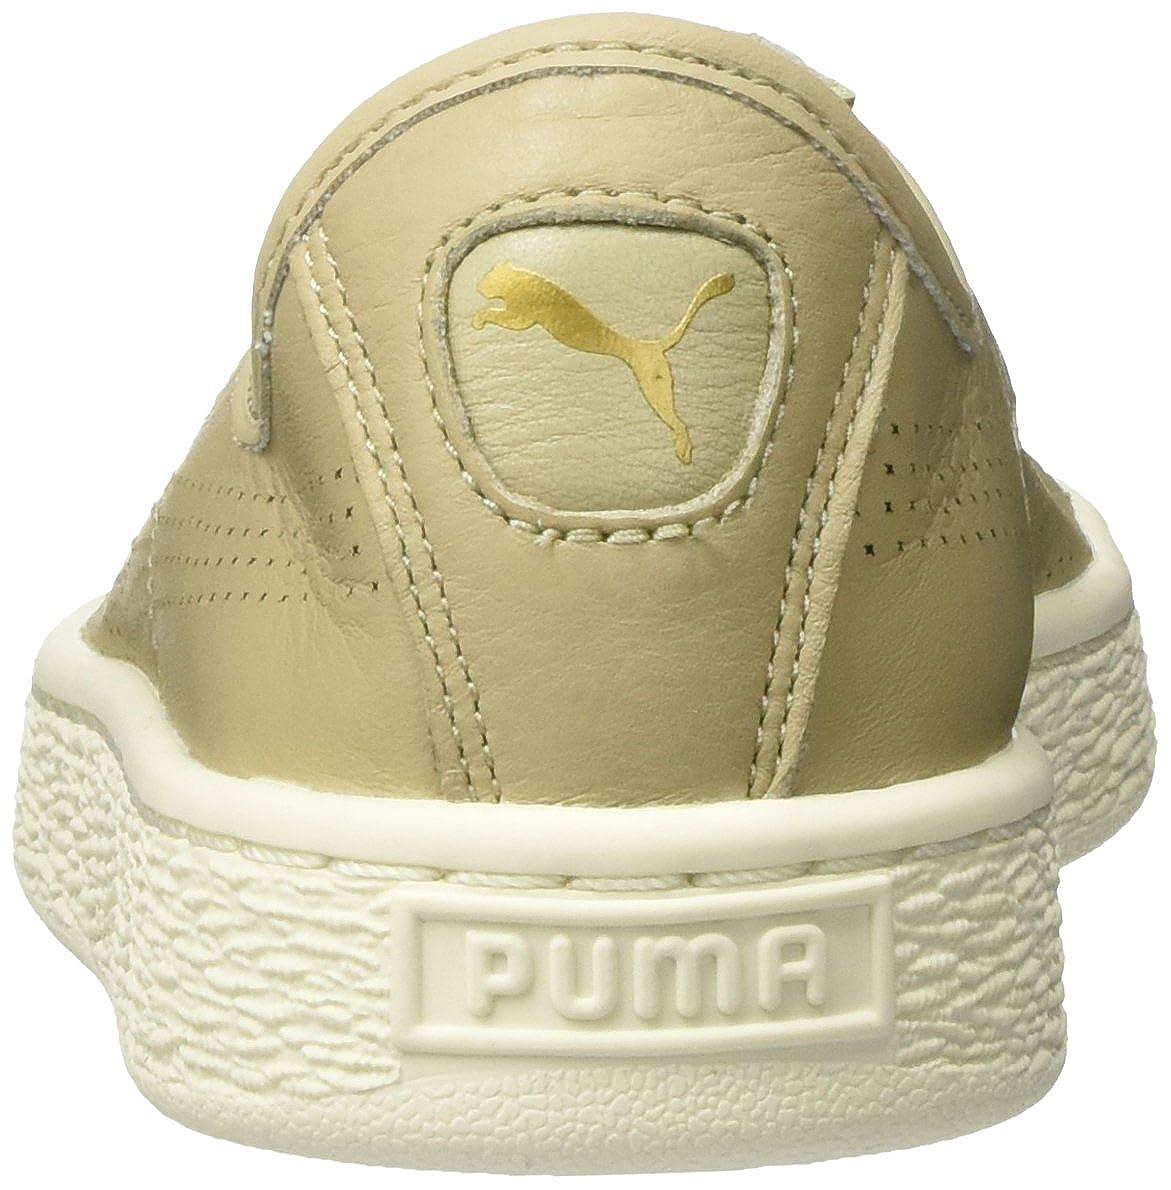 3b74eb412be8 Puma Unisex Adults  Basket Classic Soft Trainers  Amazon.co.uk  Shoes   Bags